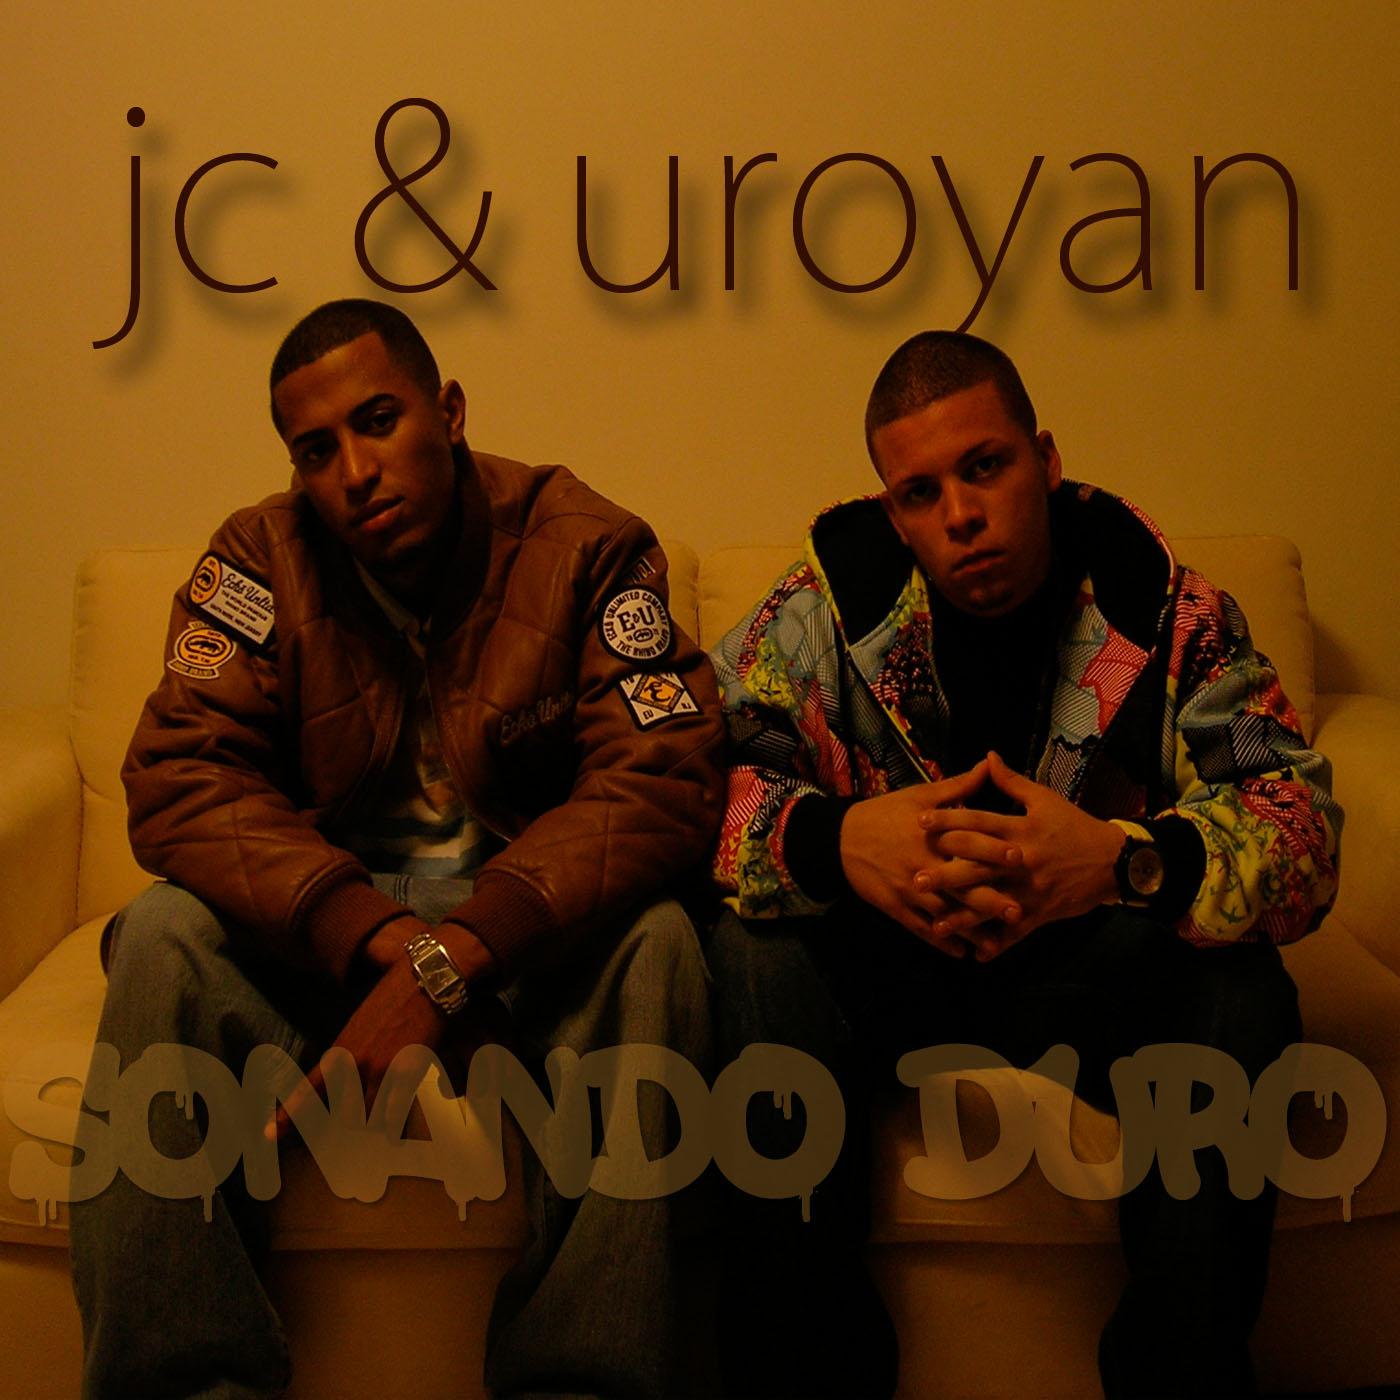 JC & Uroyan - Sonando Duro